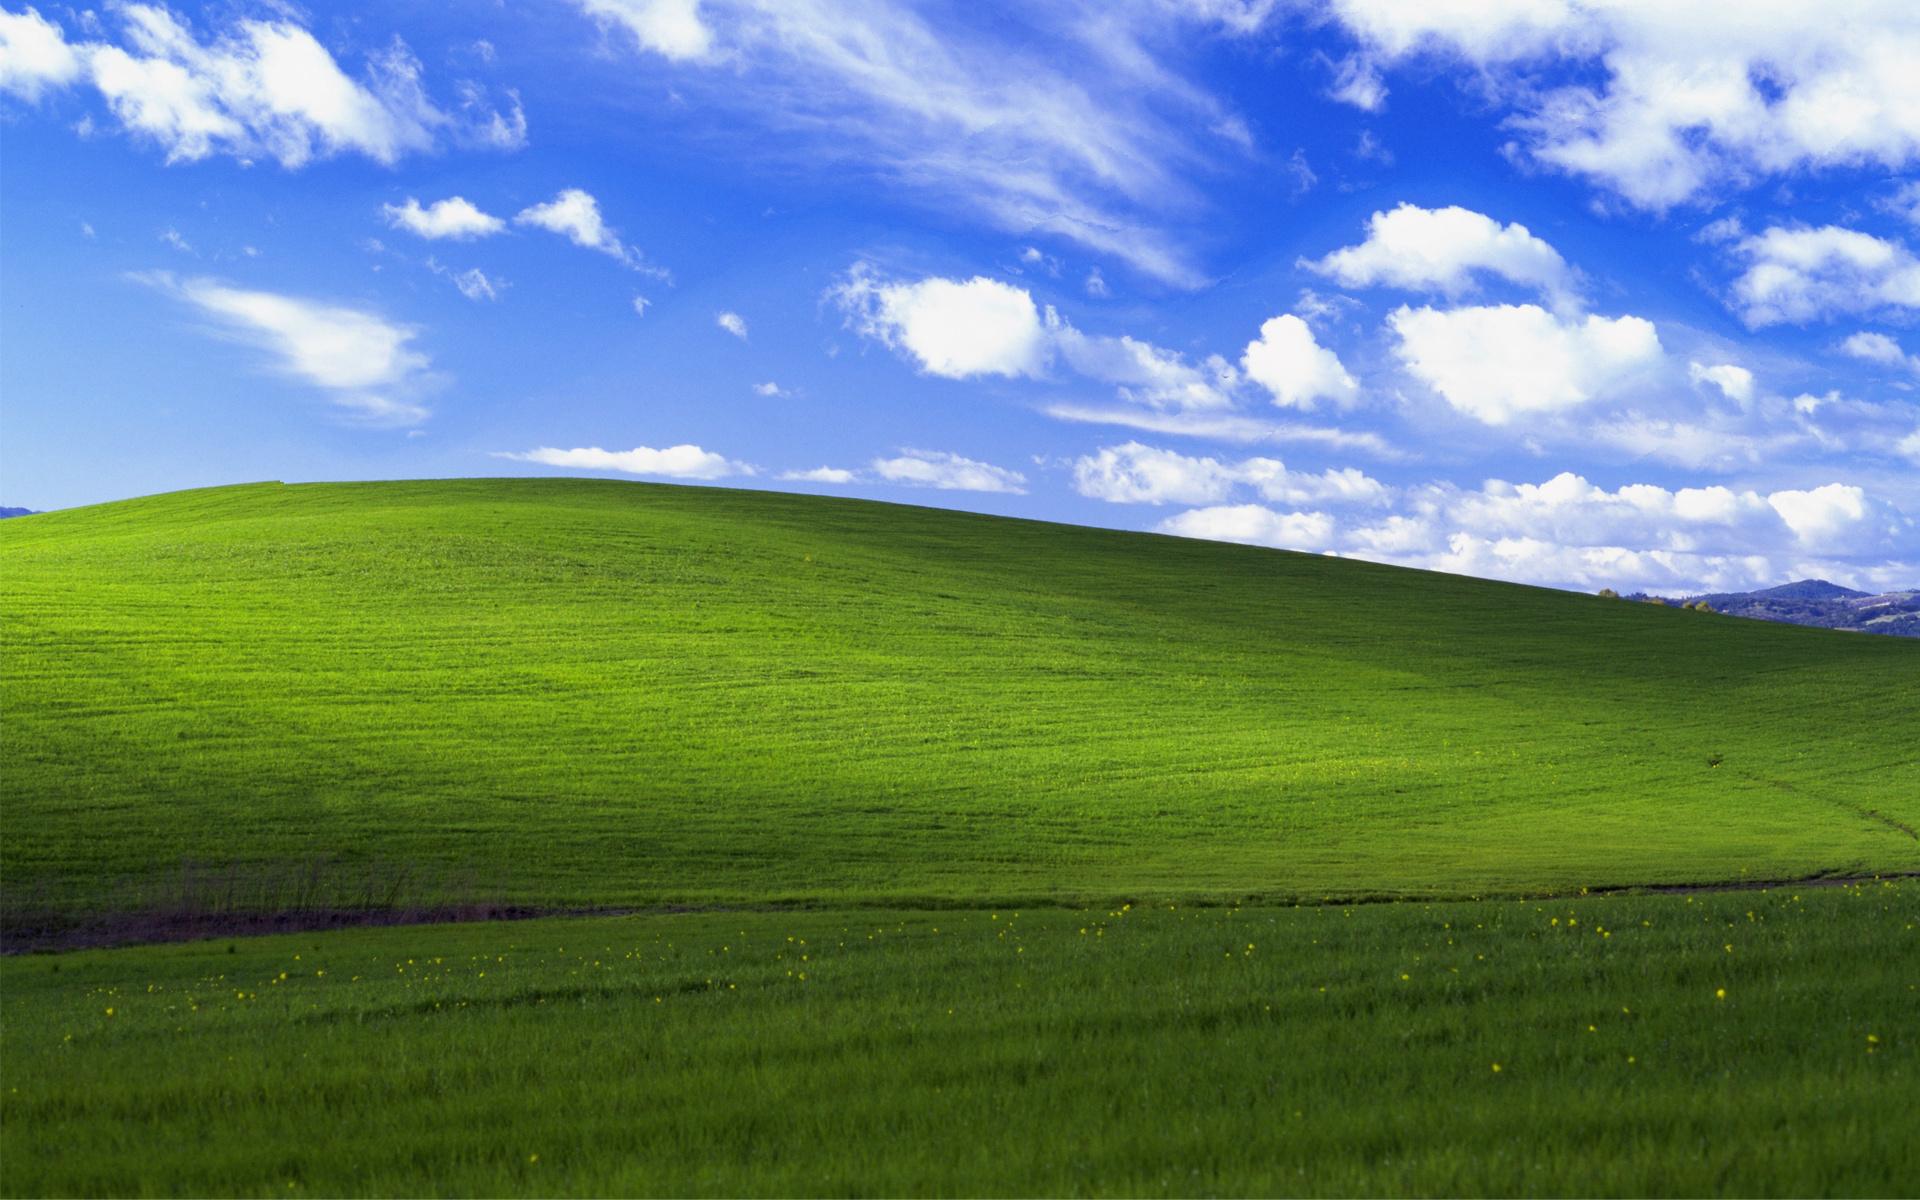 Customizing windows xp wallpaper top windows tutorials - Car wallpaper for windows xp ...